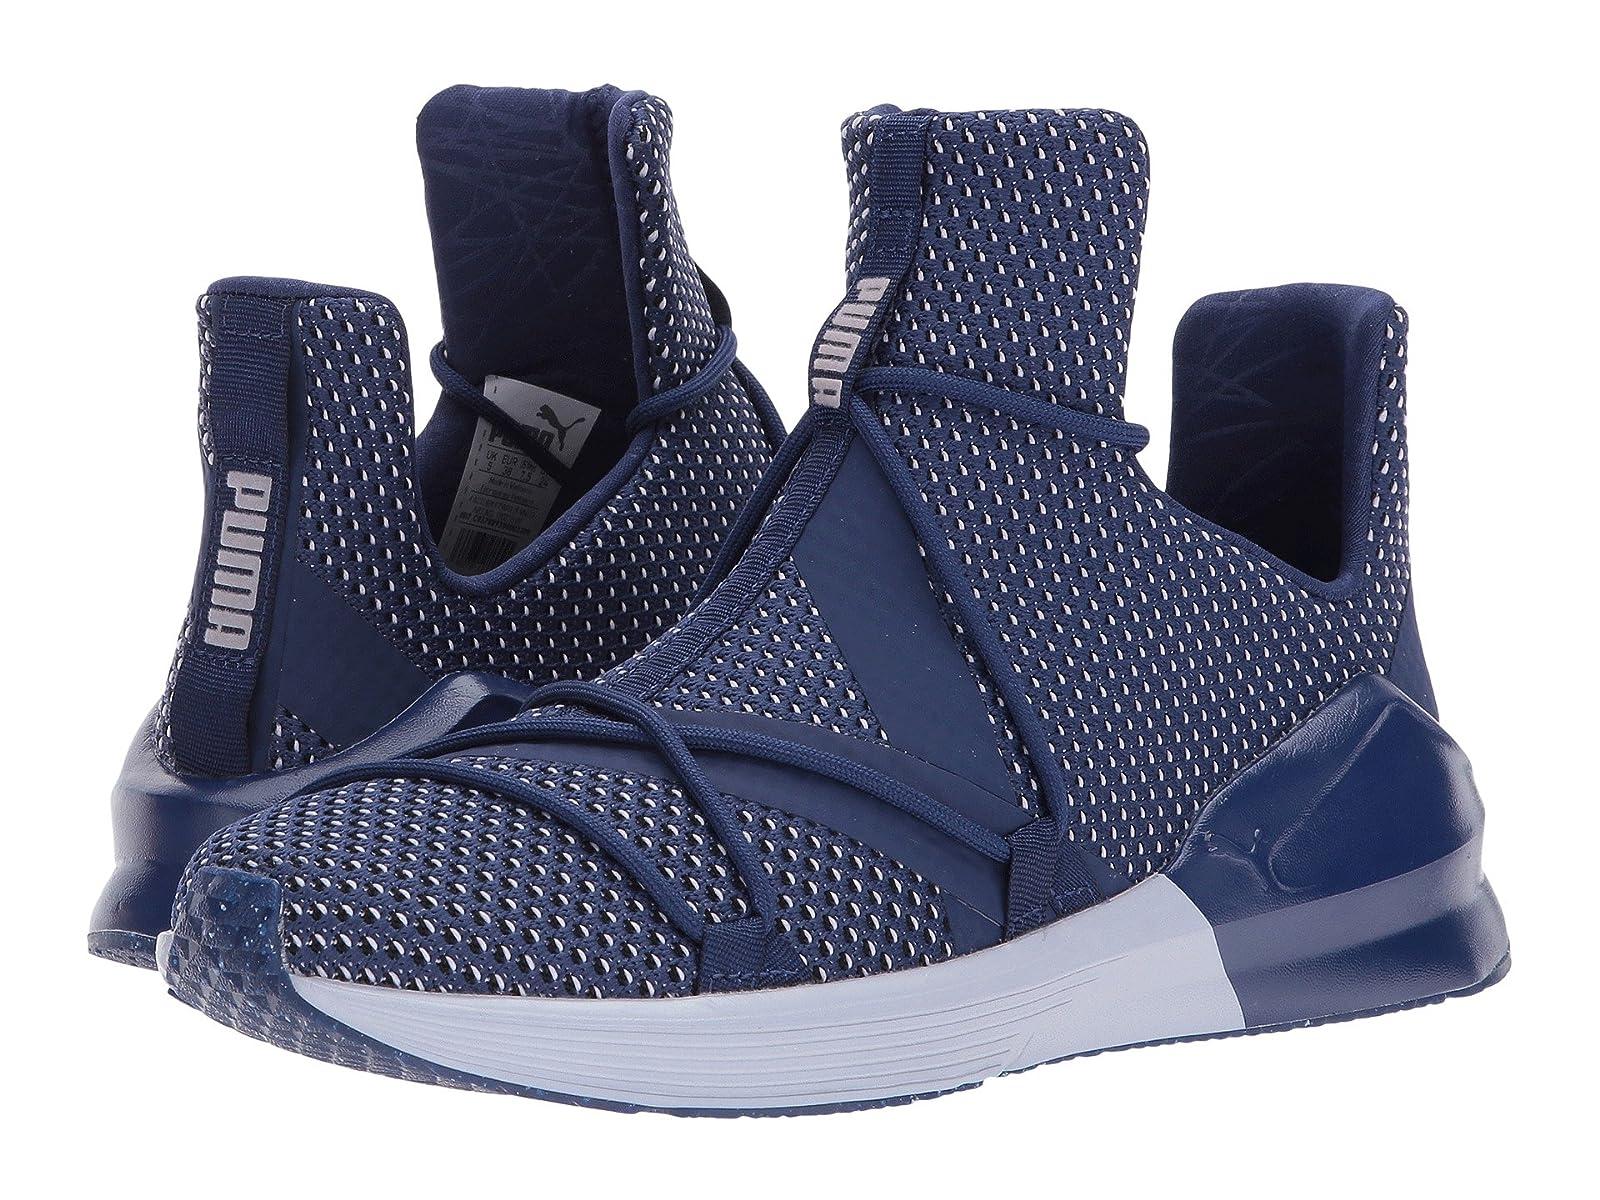 PUMA Fierce Rope Velvet VRCheap and distinctive eye-catching shoes